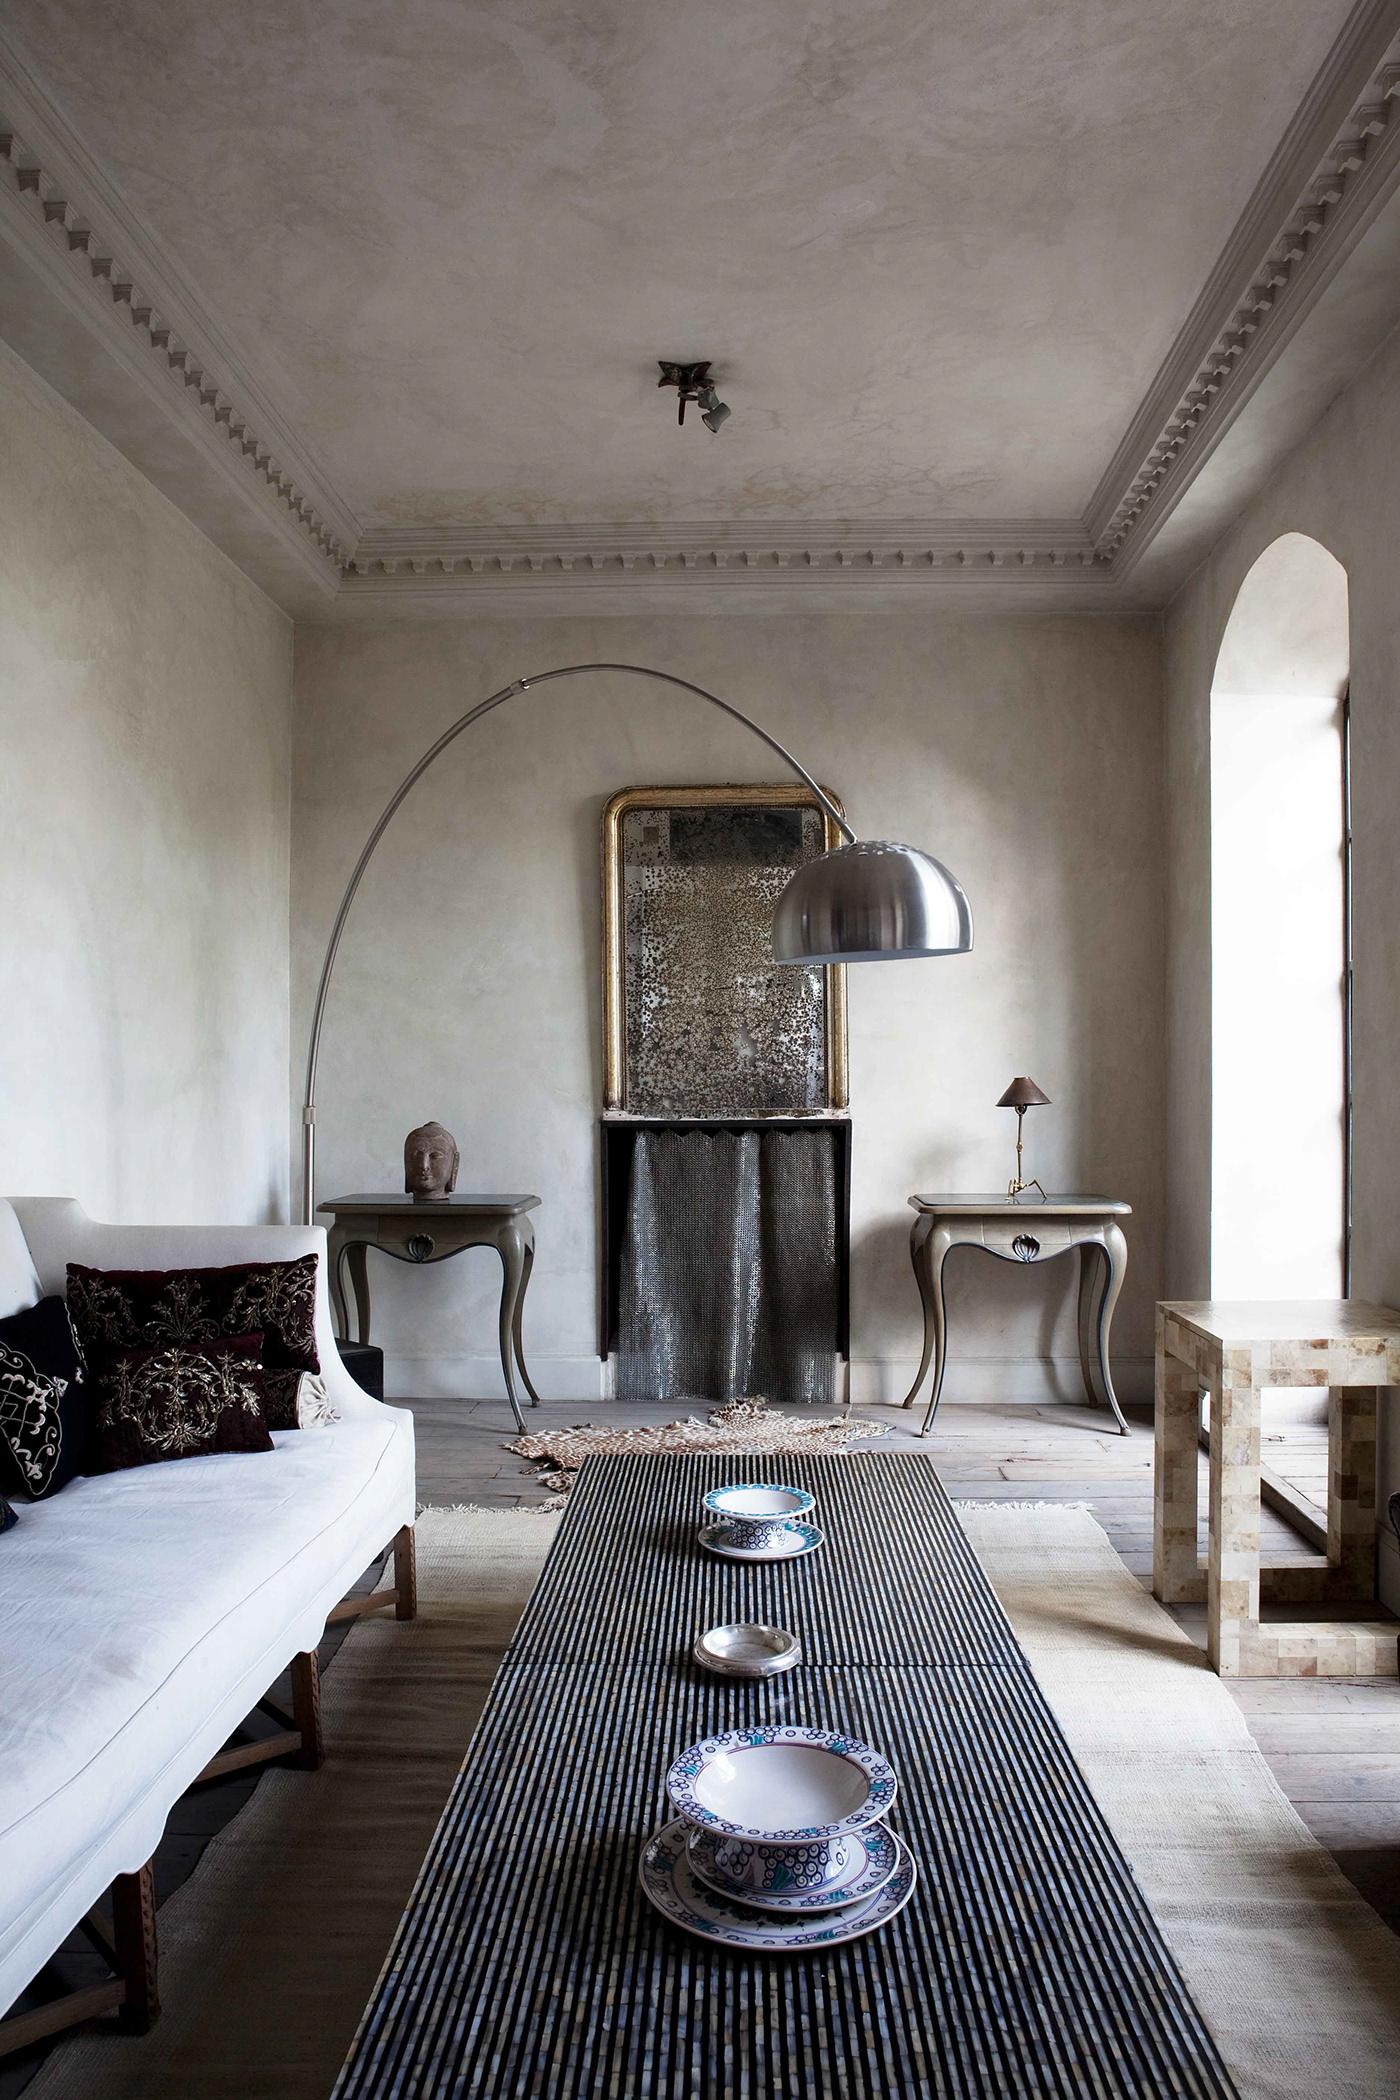 decoration Ev Tekstili furniture home textile Life Style mobilya product still life